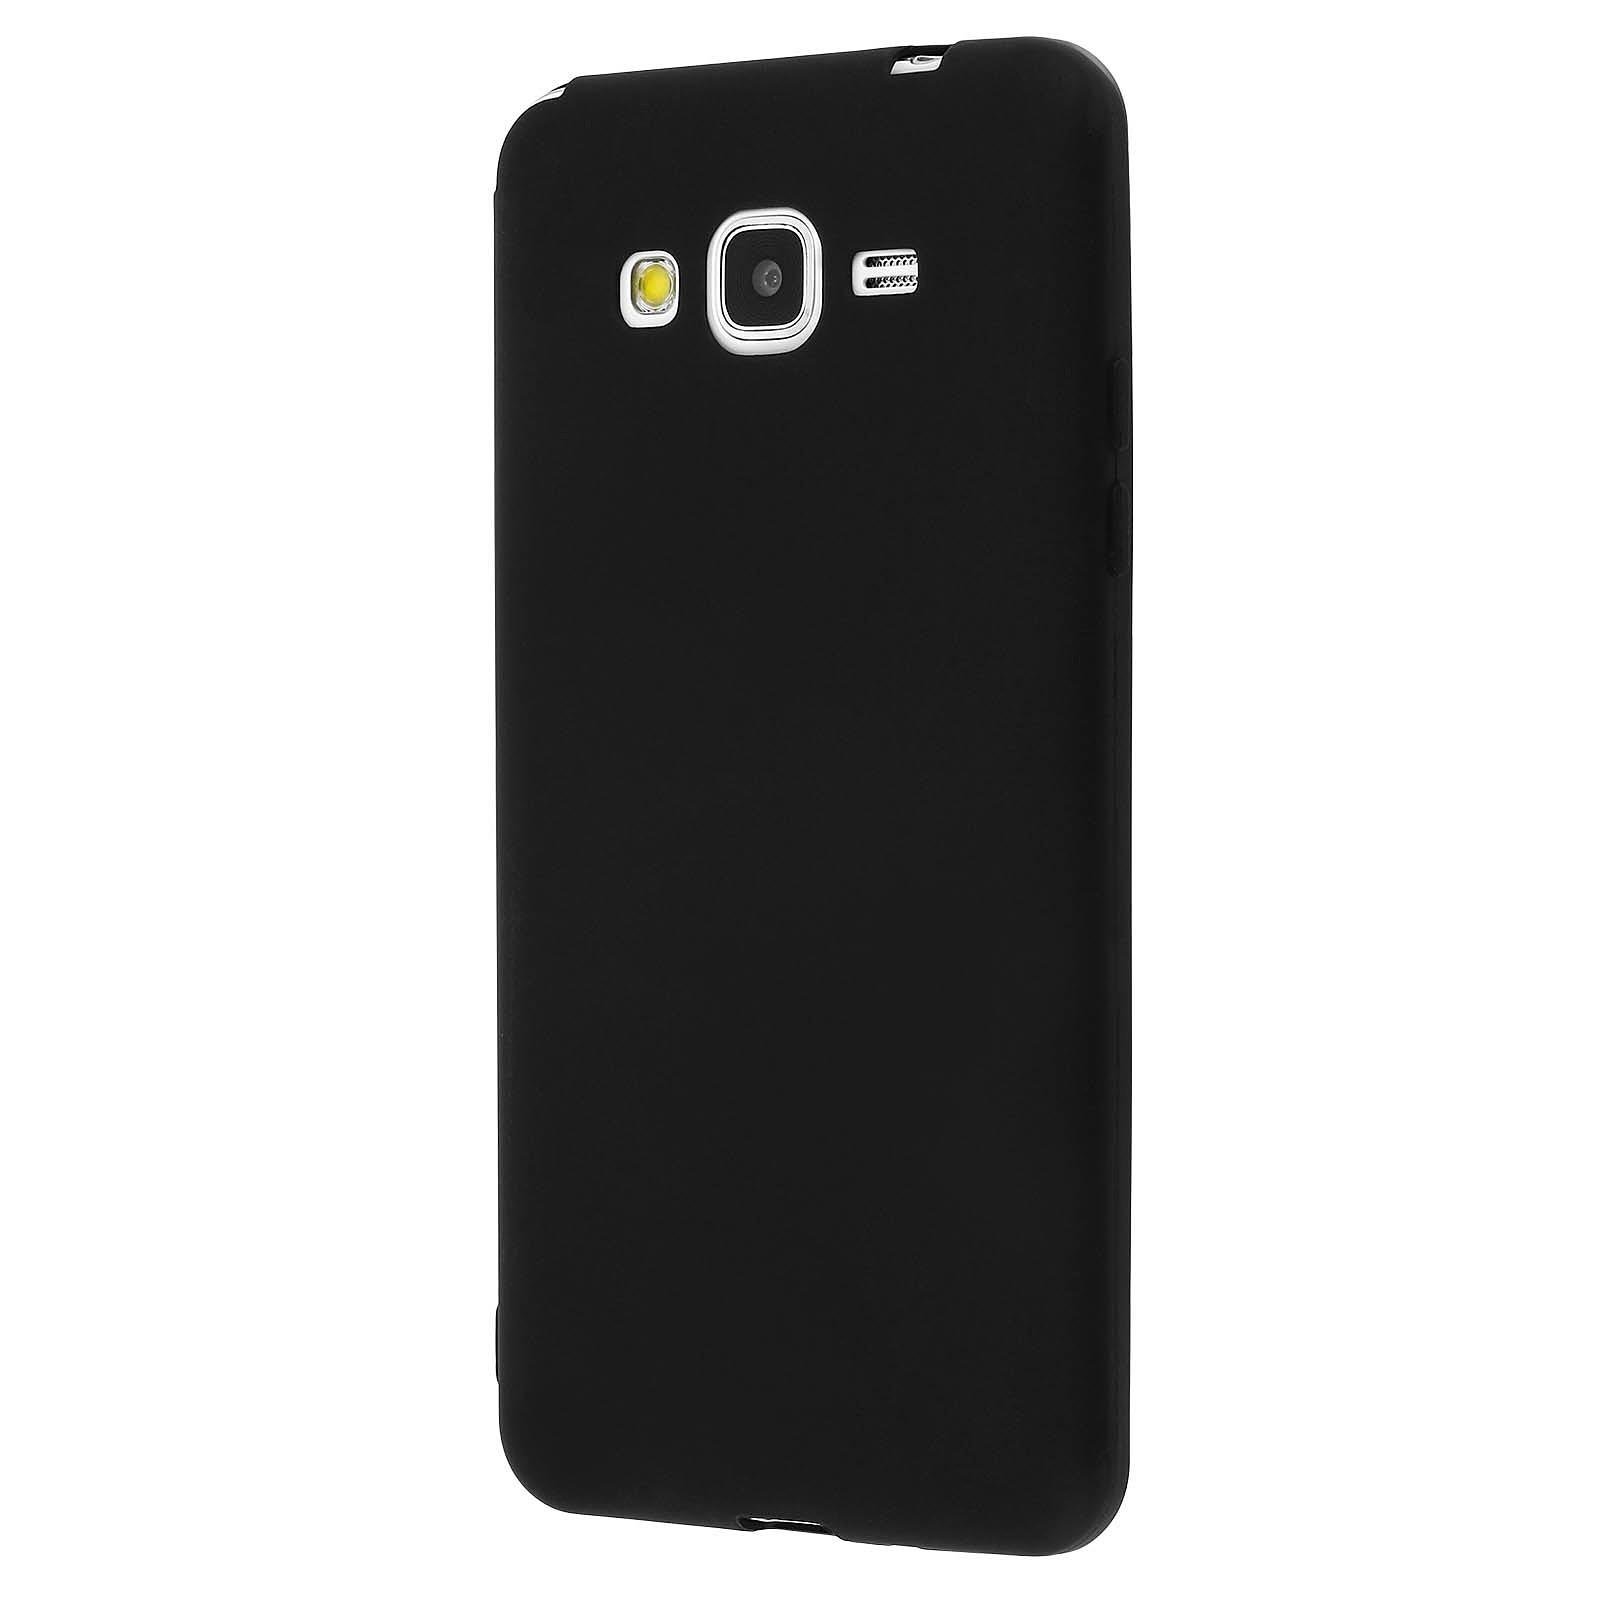 Avizar Coque Noir pour Samsung Galaxy Grand Prime